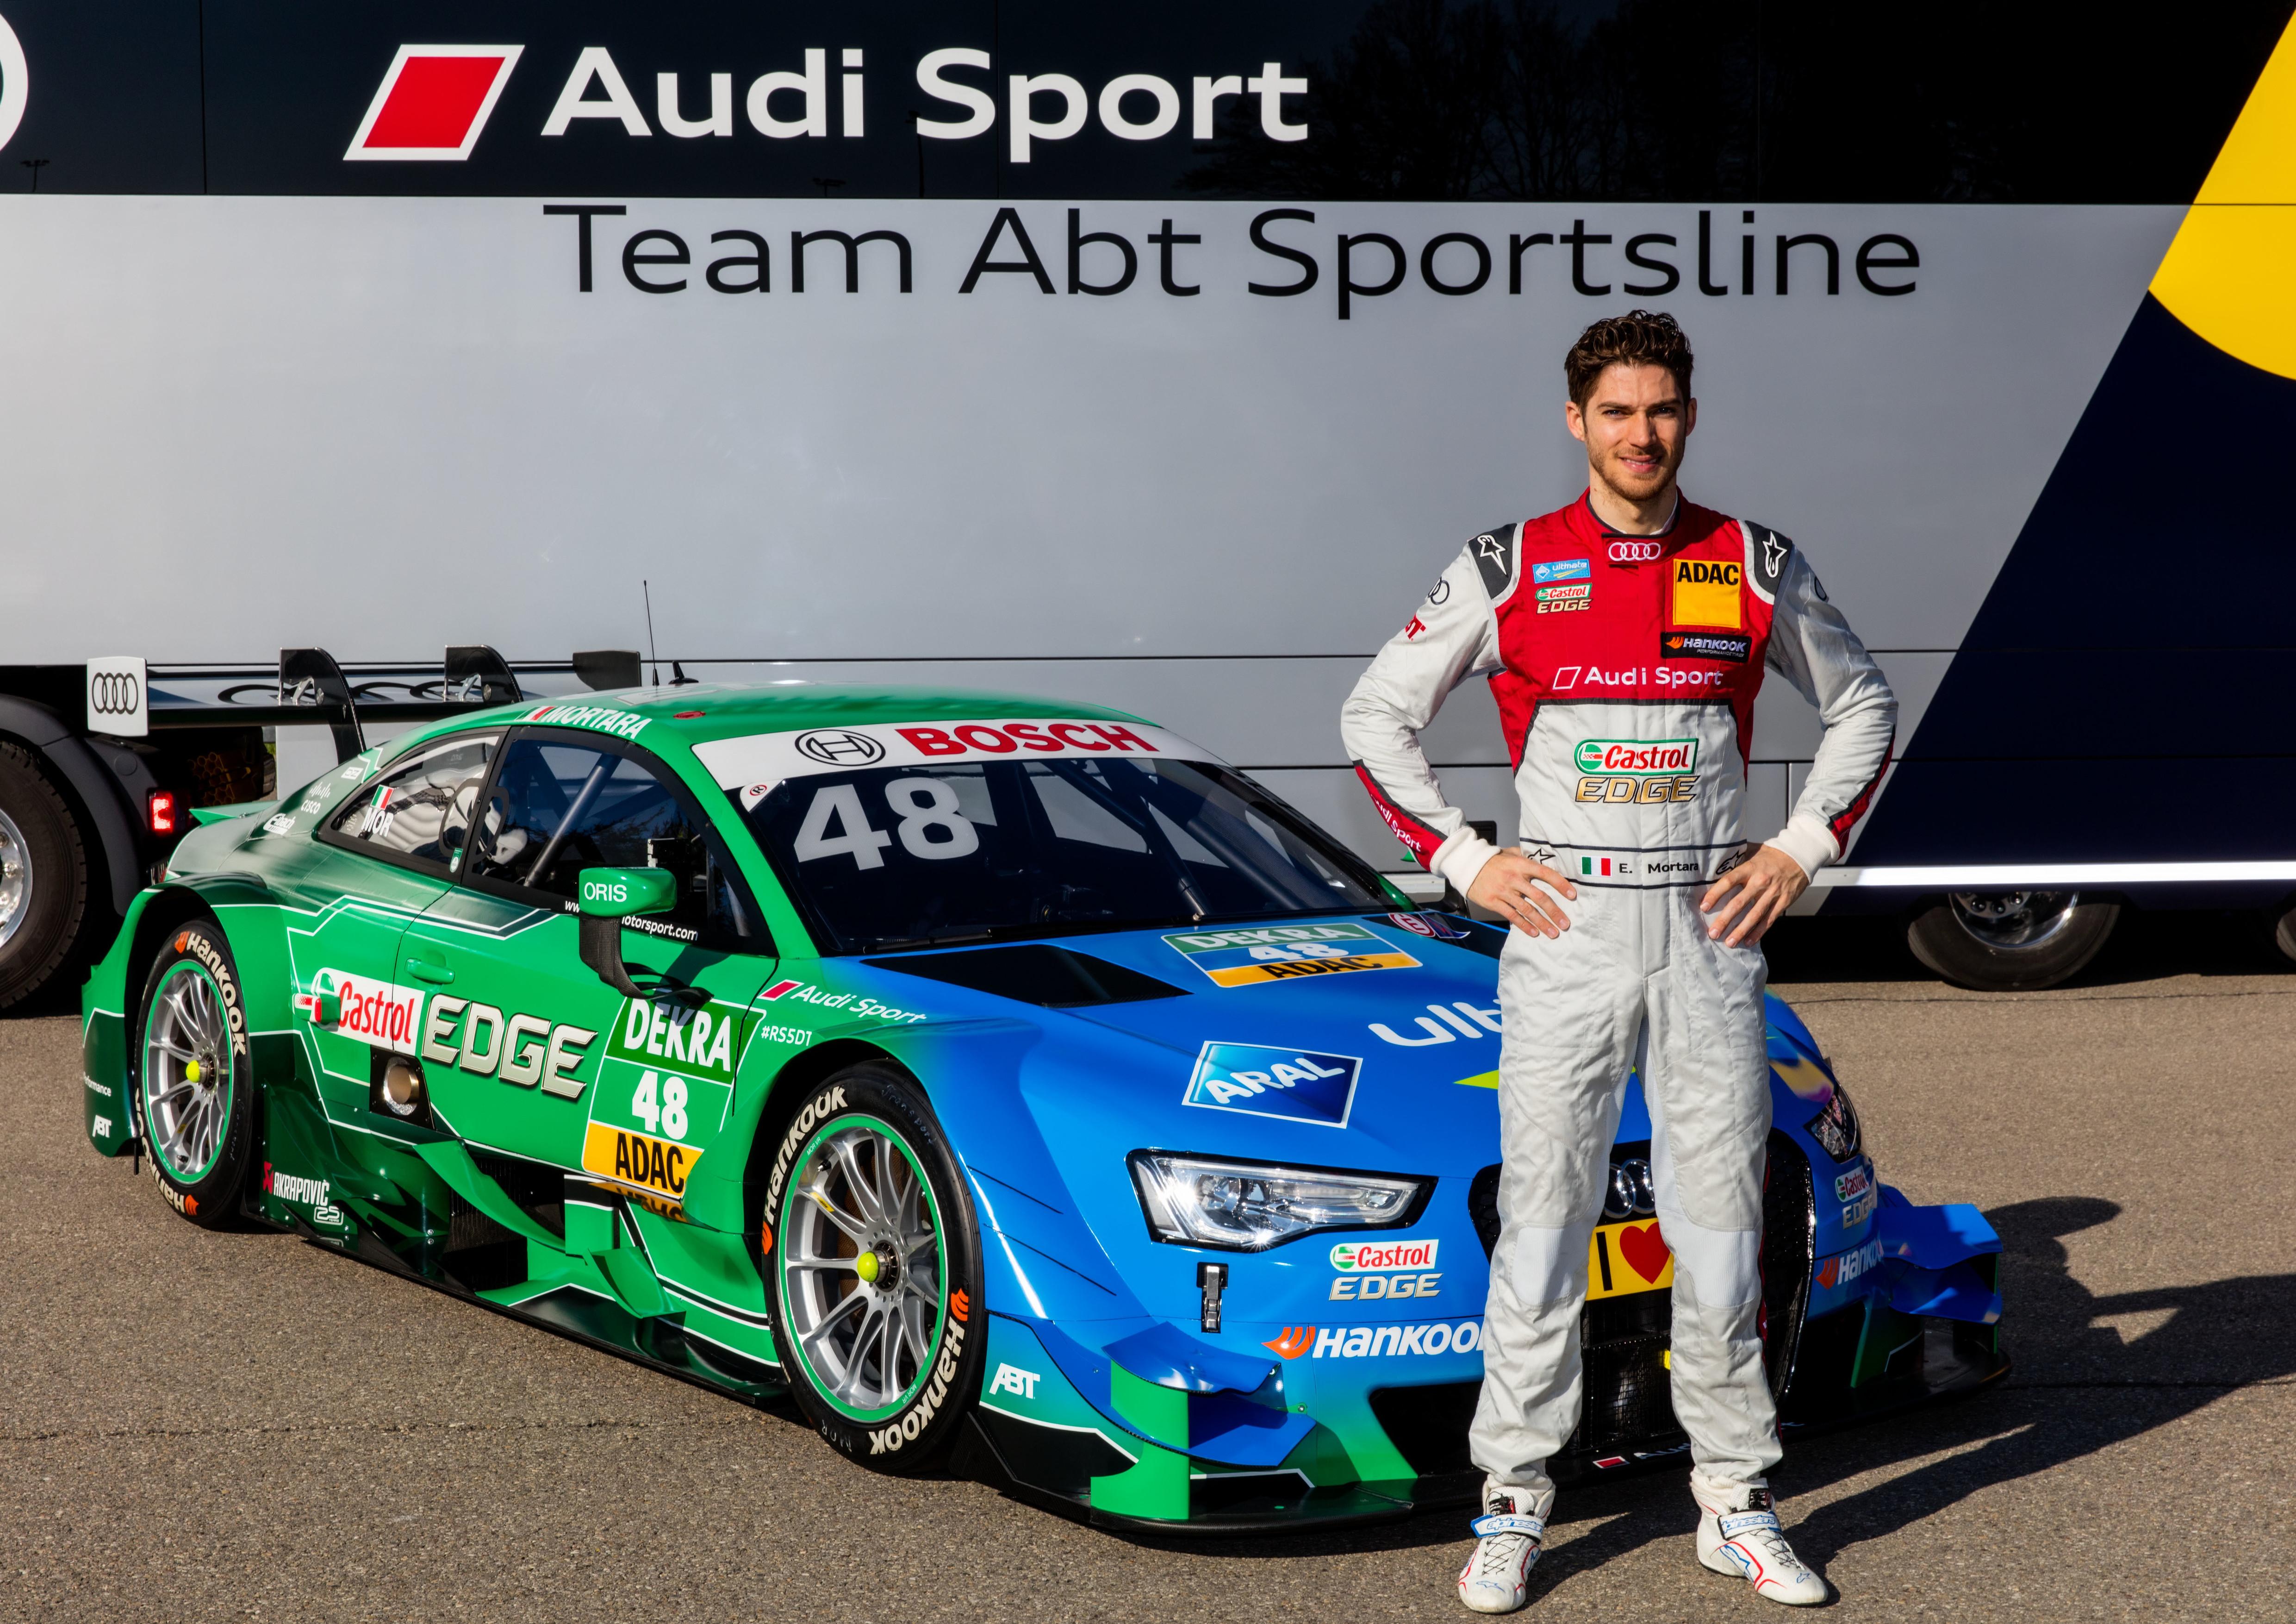 #48 Edoardo Mortara Castrol EDGE Audi RS5 DTM